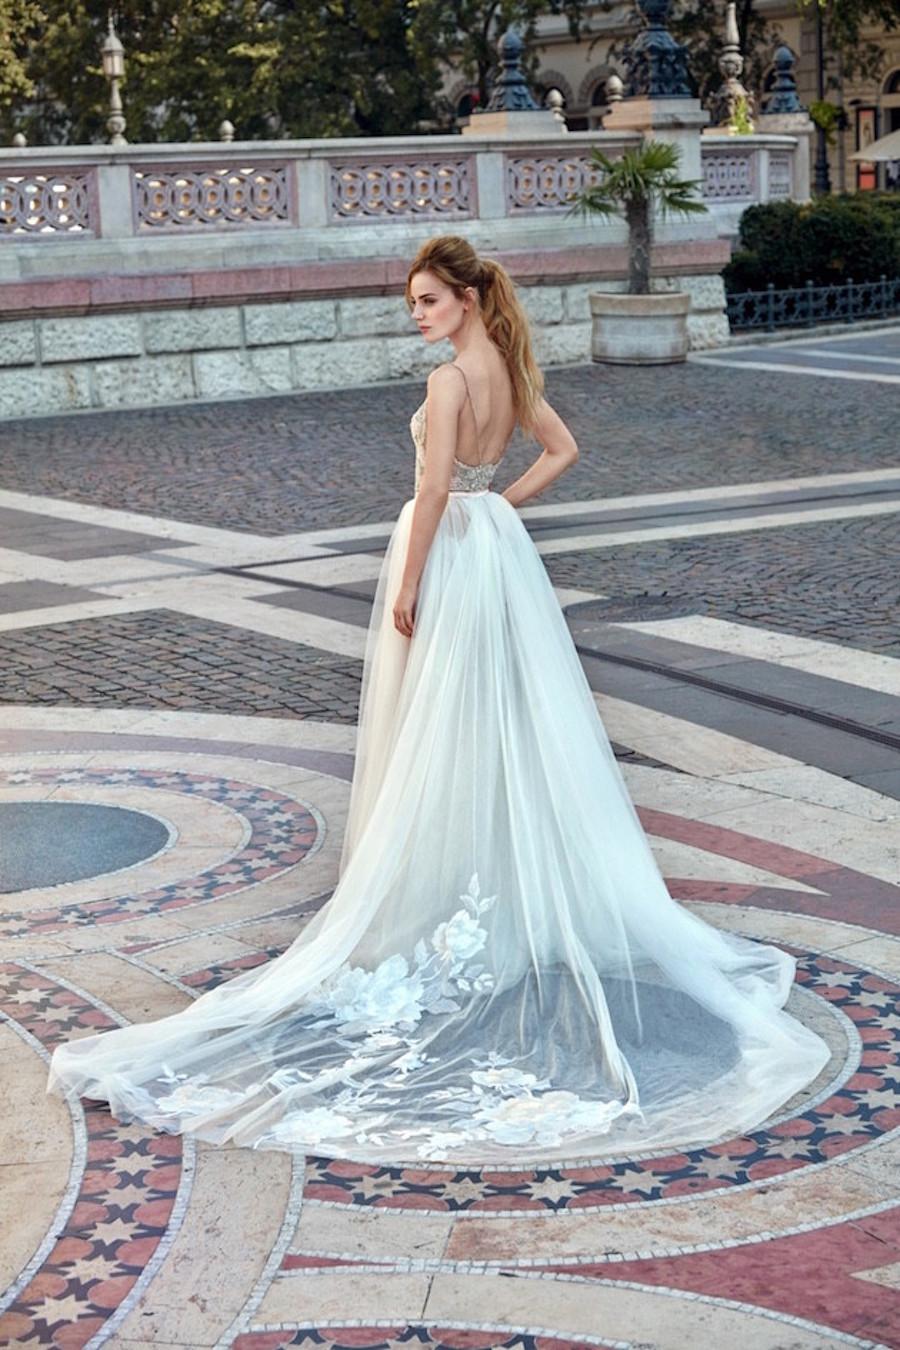 GALA Ready to Wear by Galia Lahav